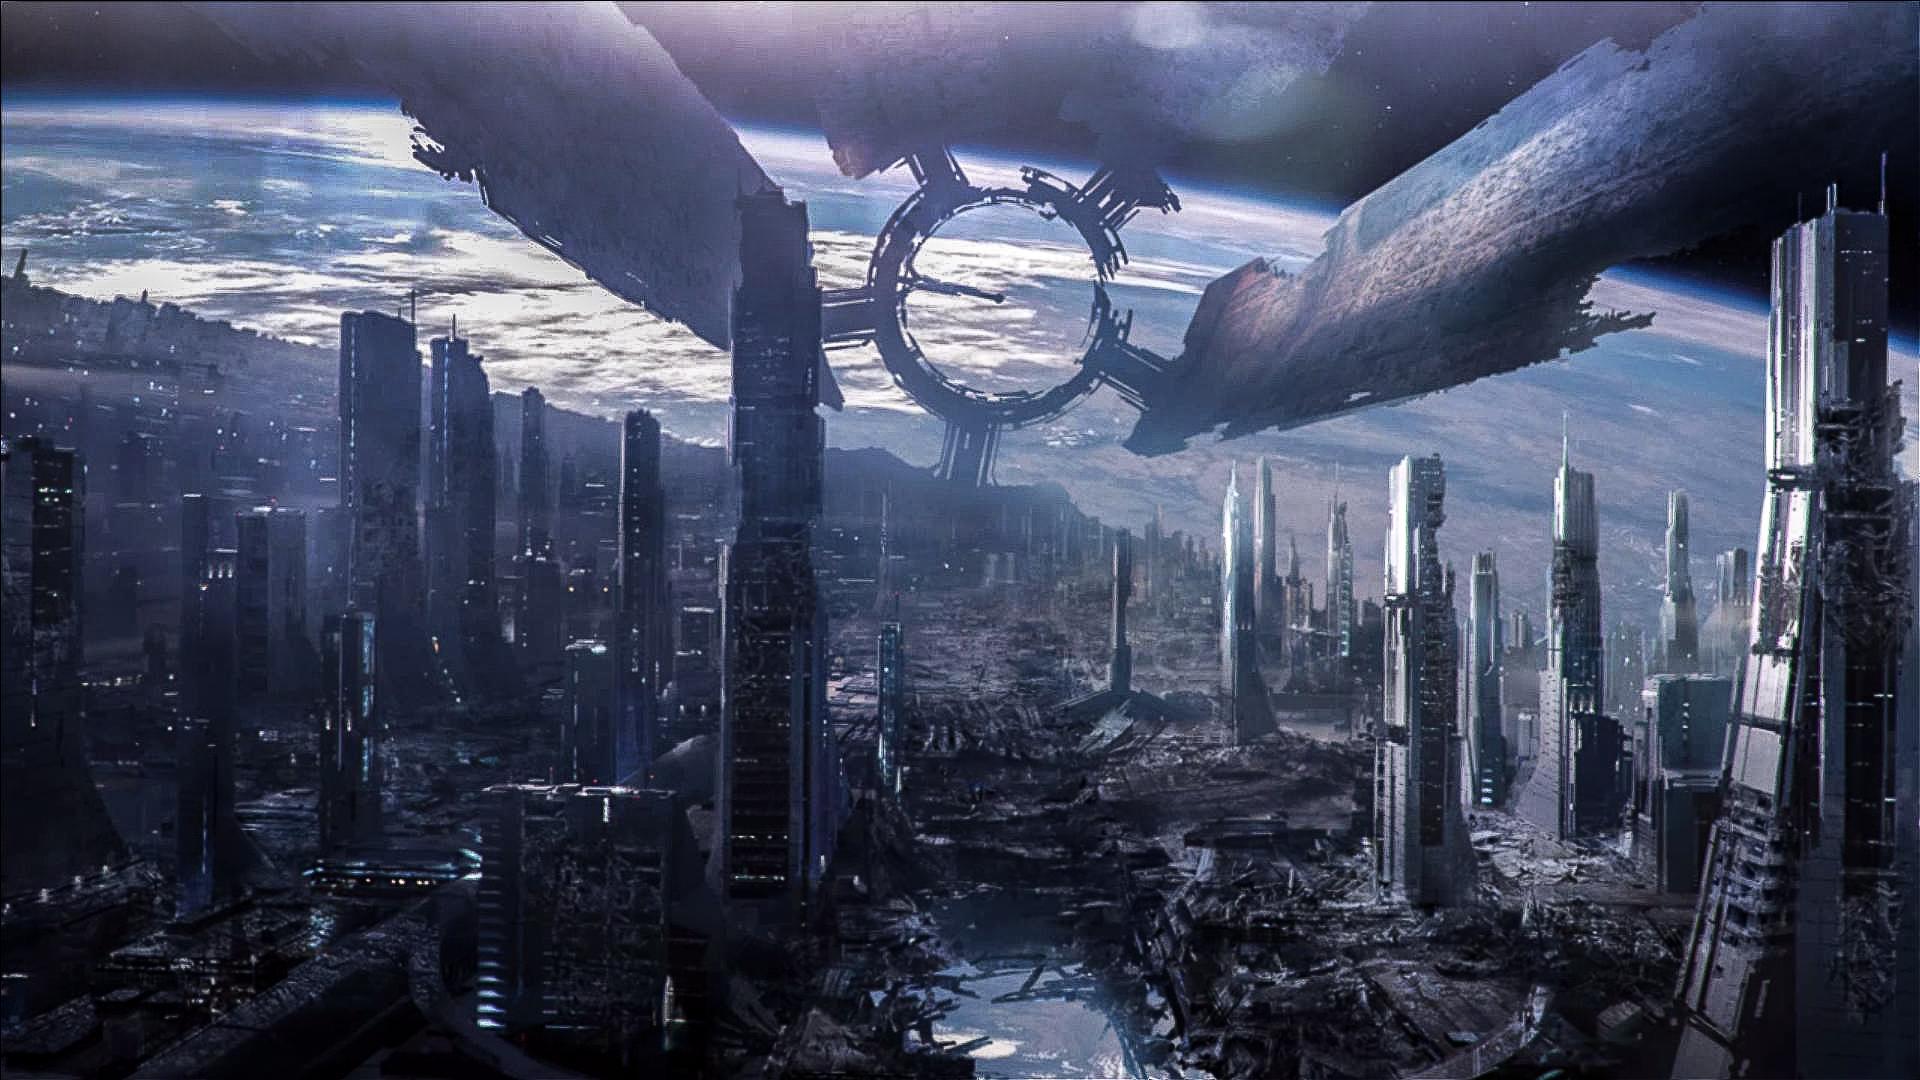 Mass Effect 3 Destroyed Citadel